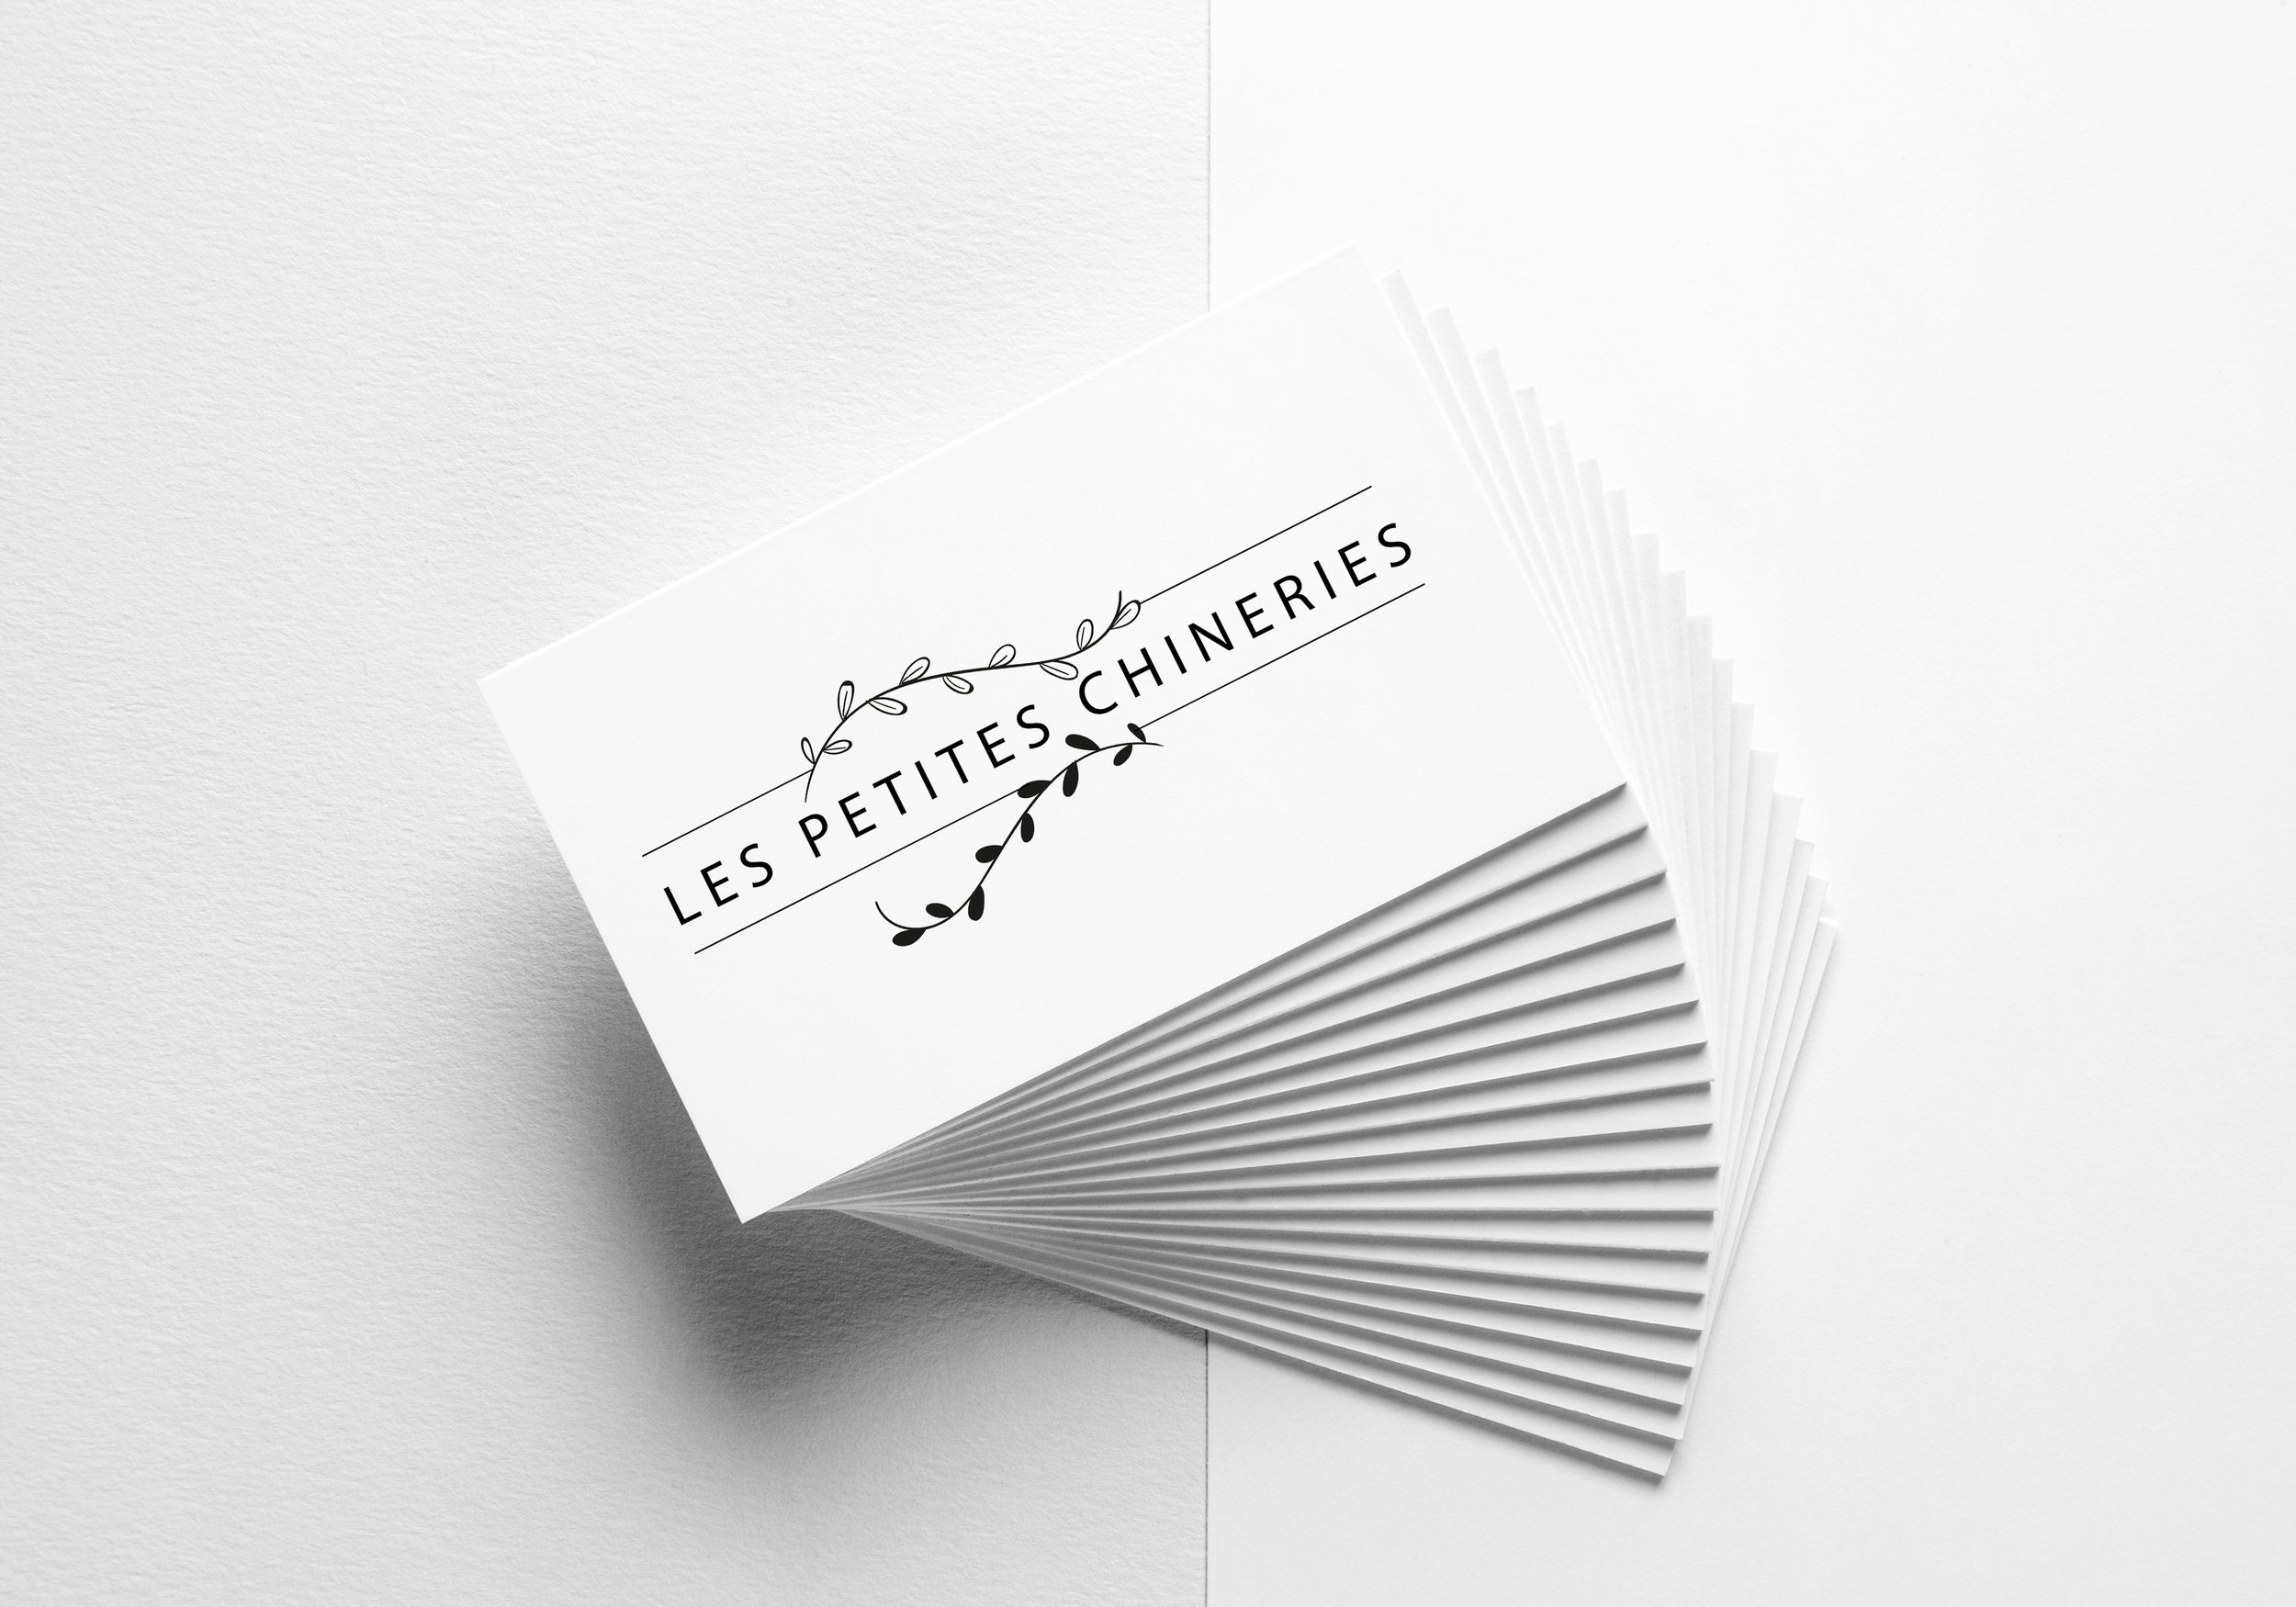 Les petites chineries mock up cartes visite.jpg